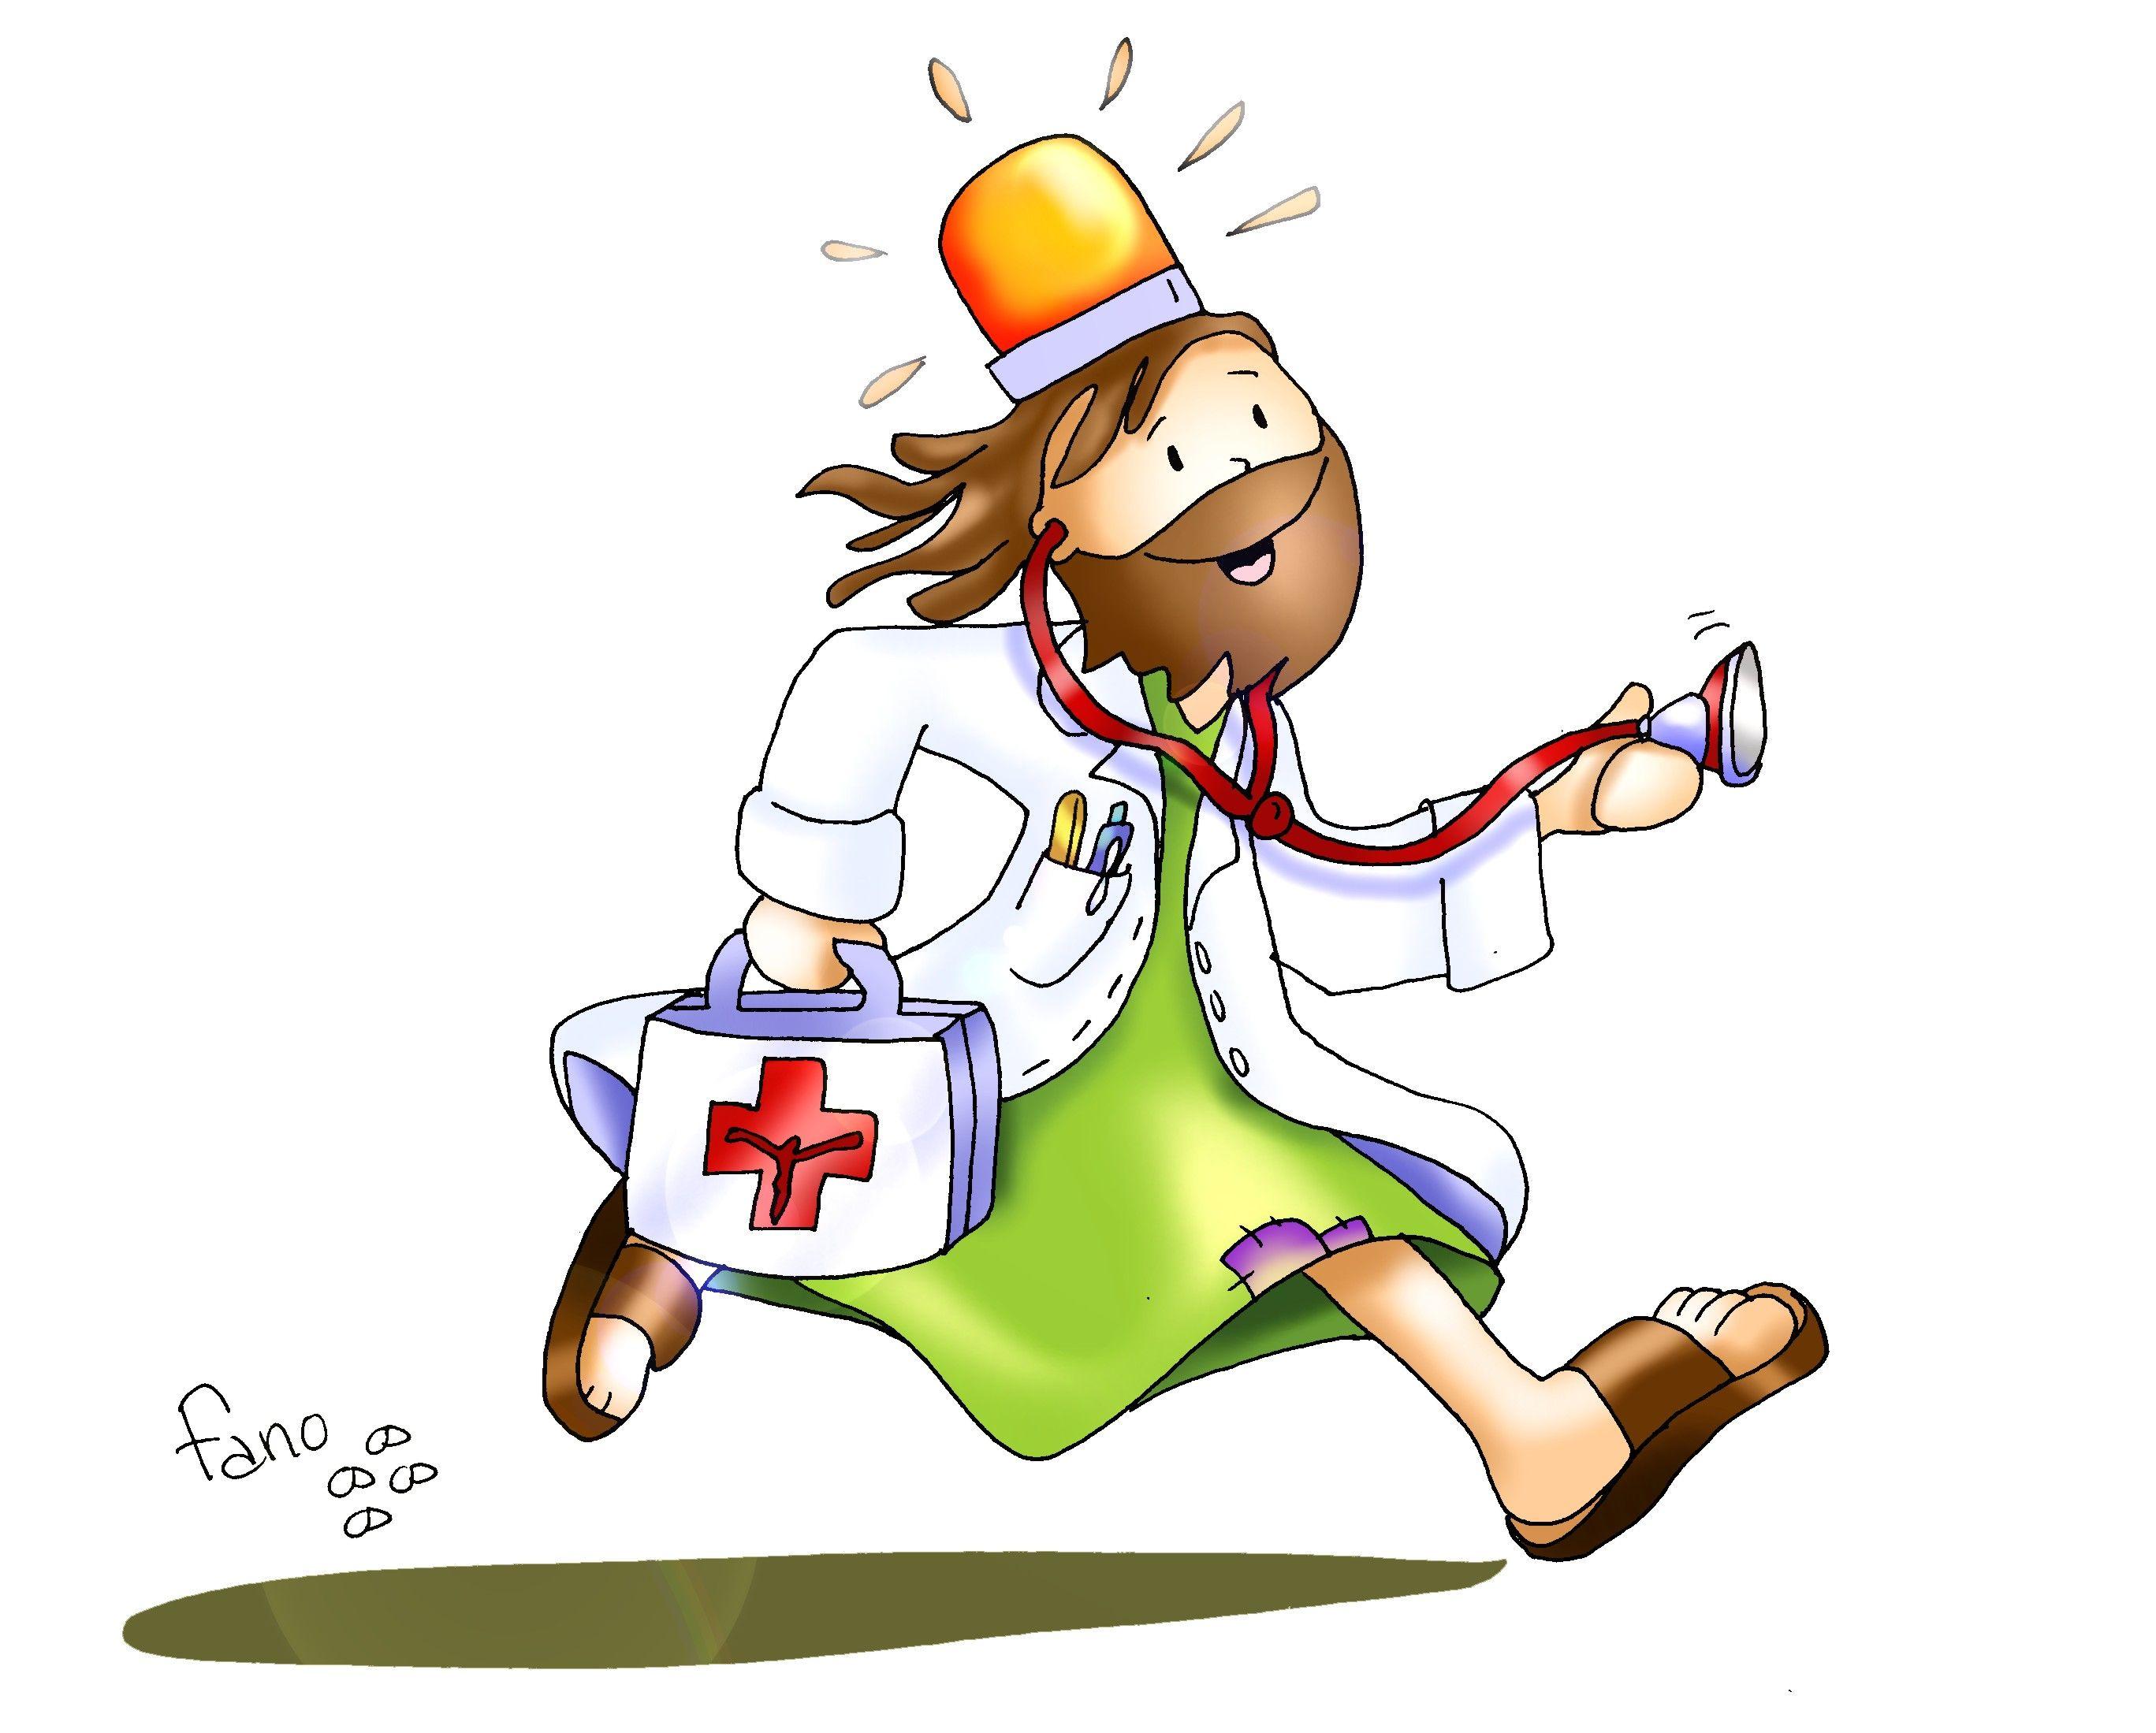 Sacerdote, sanitario del alma